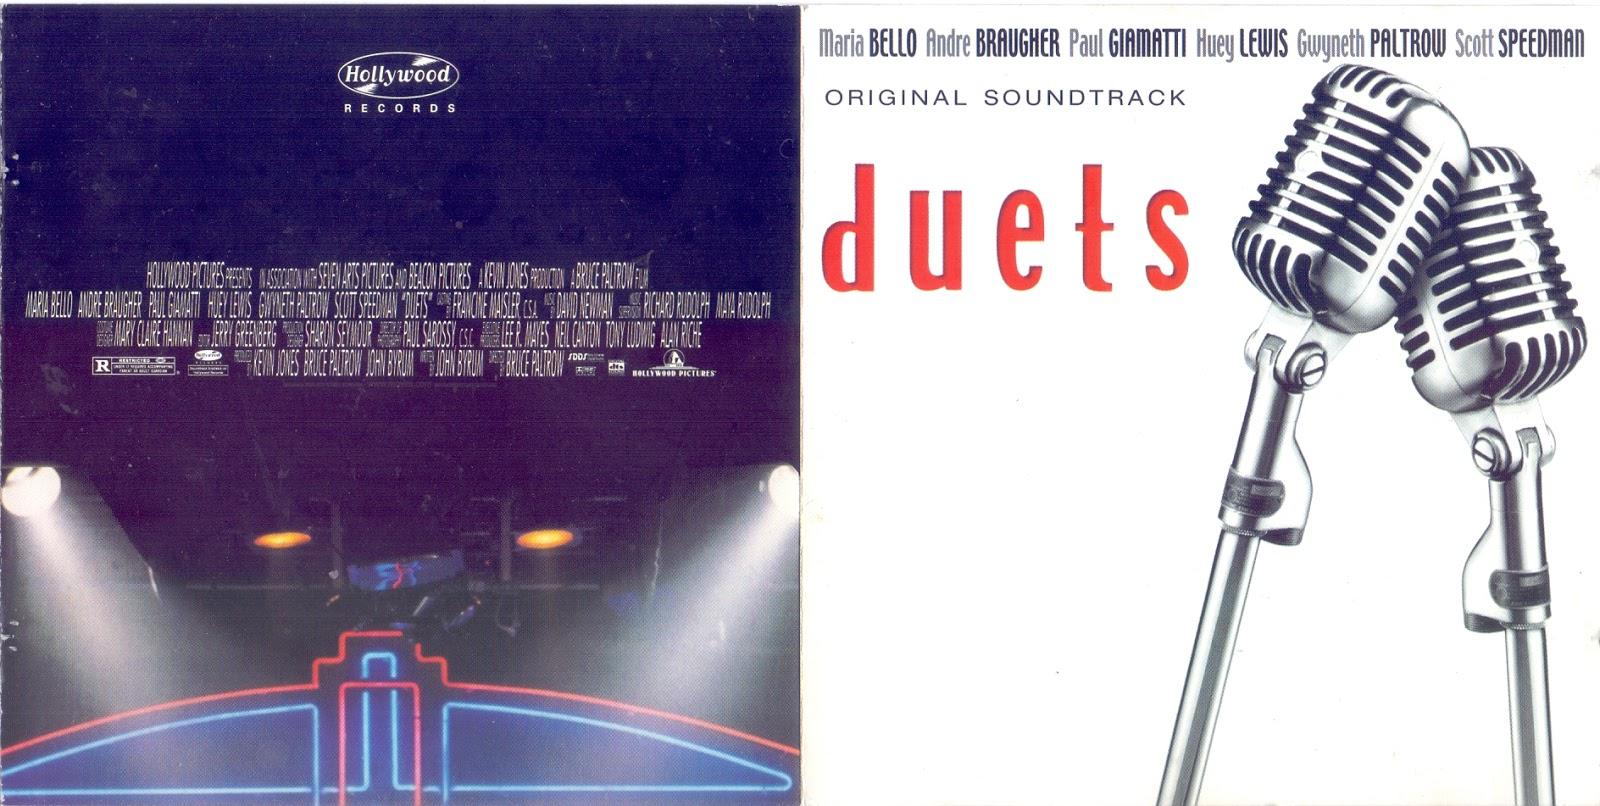 DISCO GIRLS BABES: Original Soundtrack 'Duets'